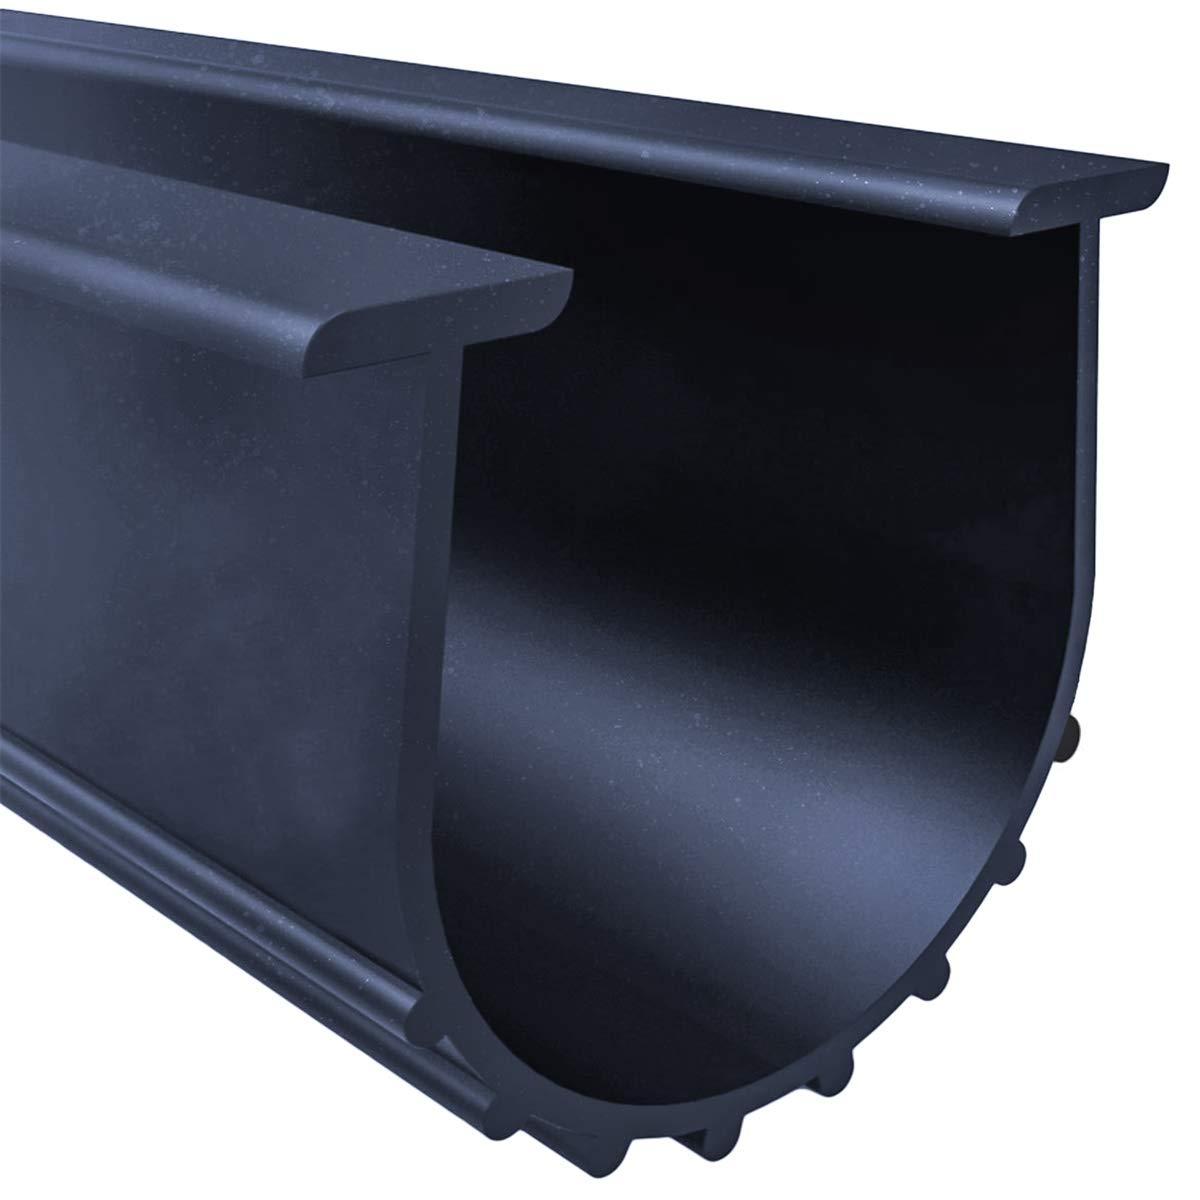 "Garage Door Bottom Weather Stripping Kit Rubber Seal Strip Replacement, Weatherproofing Universal Sealing Professional Grade T Rubber,5/16"" T Ends, 3 3/4"" Width X 20 Feet Lenth (Black)"